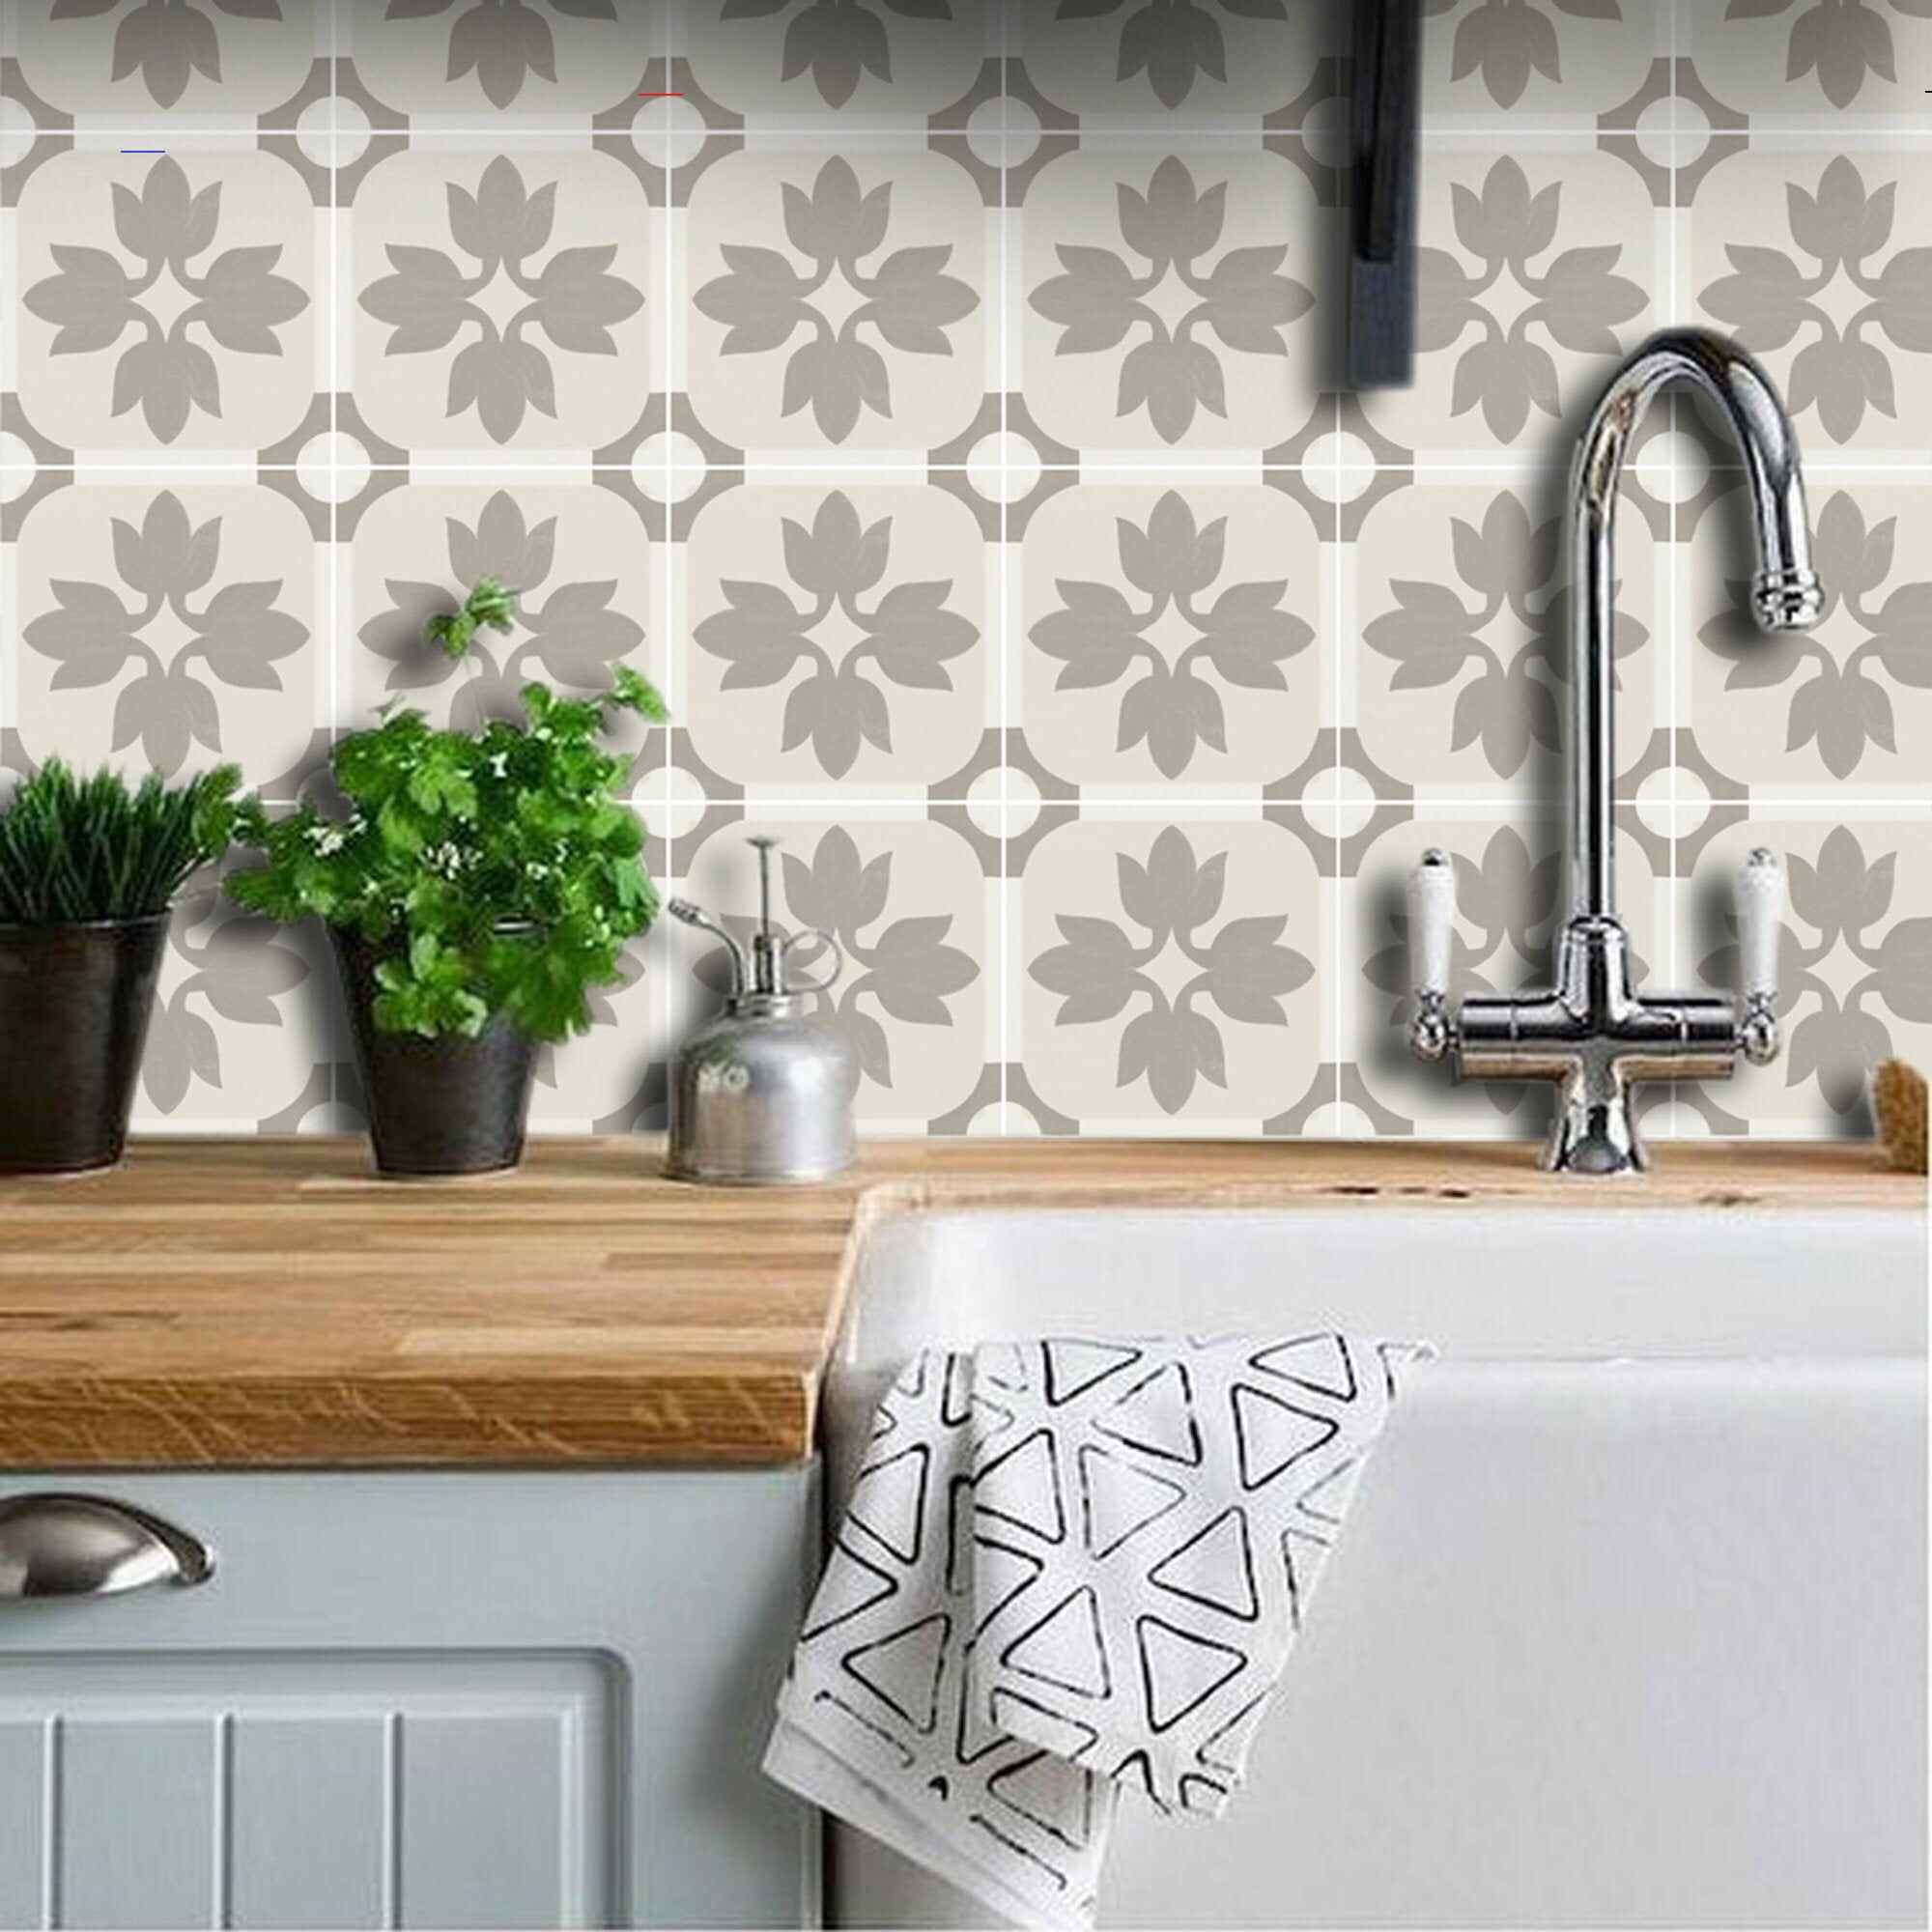 Kitchen And Bathroom Splashback Removable Vinyl Wallpaper Margot Taupe Peel Stick Bathroomsplashback Cement Tile Vinyl Wallpaper Fliesen Aufkleber